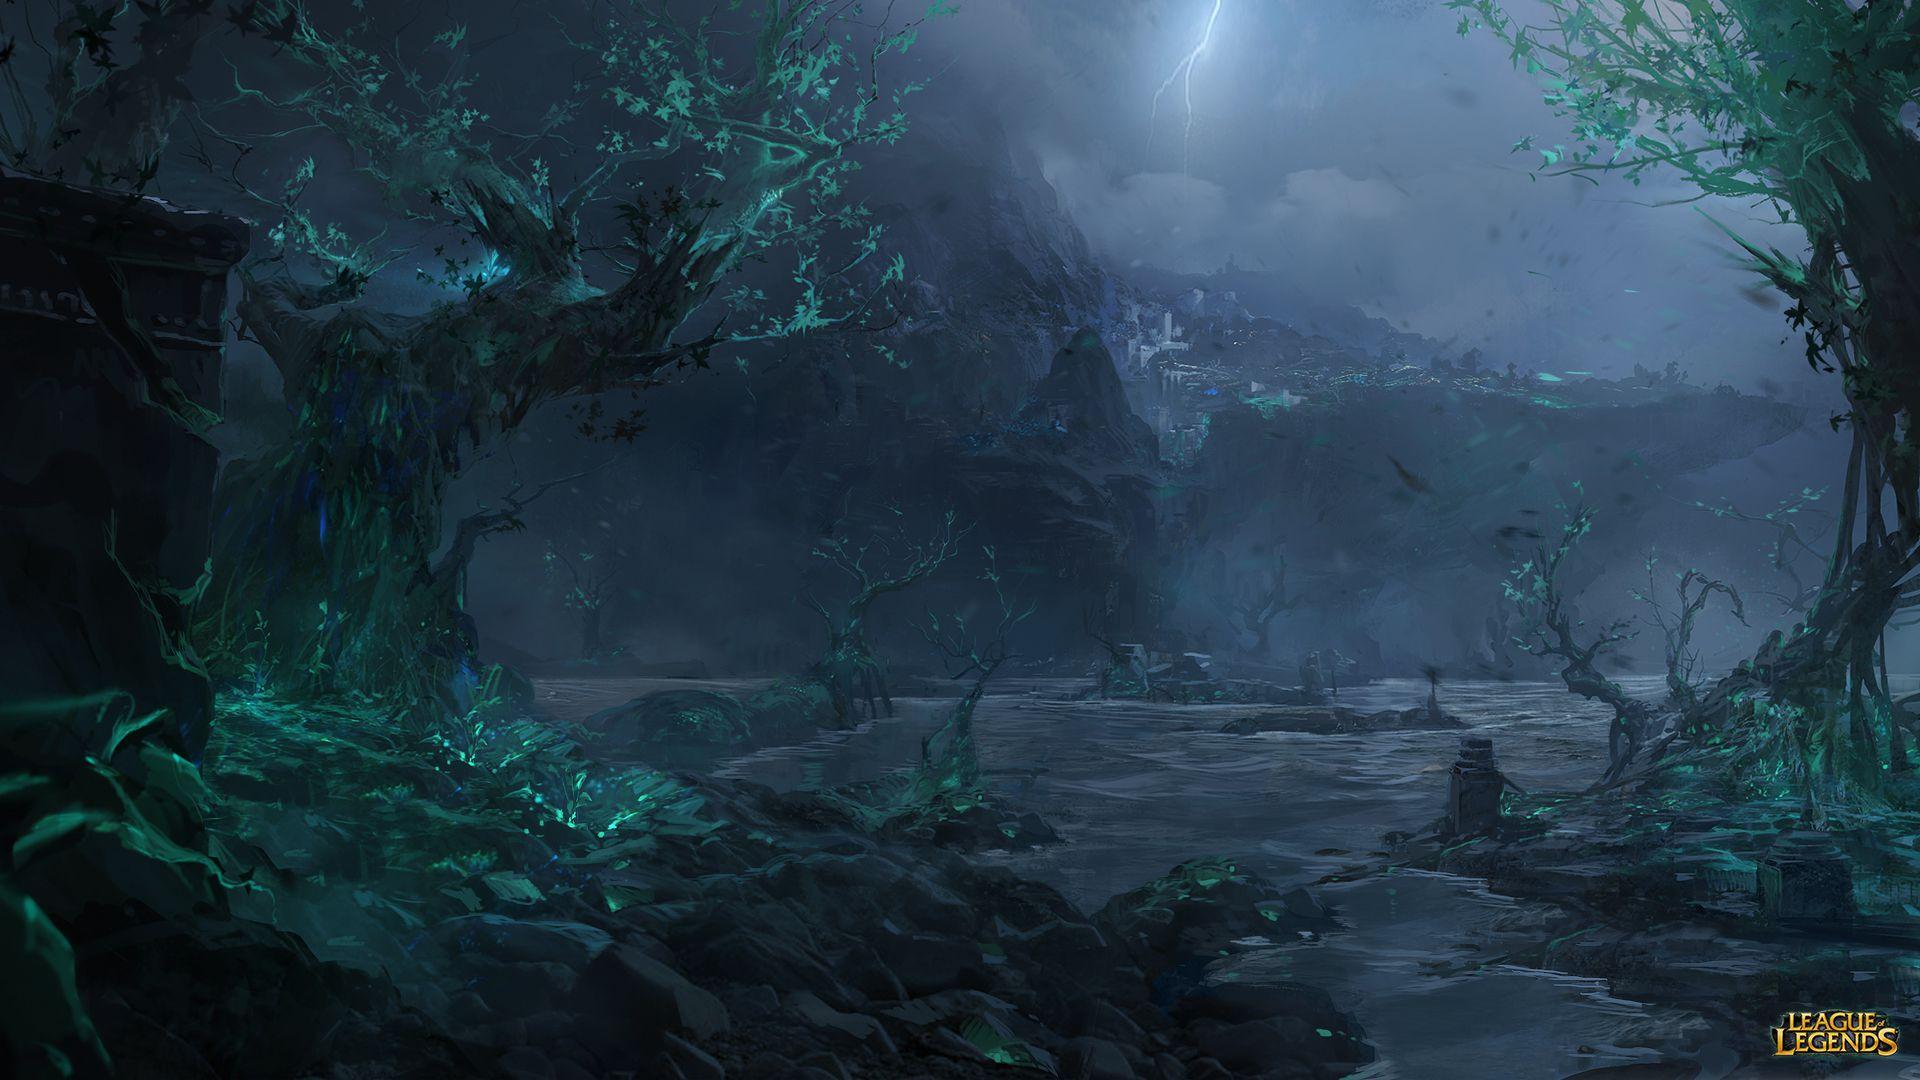 HD Shadow Isles Wallpaper - League of Legends Wallpapers